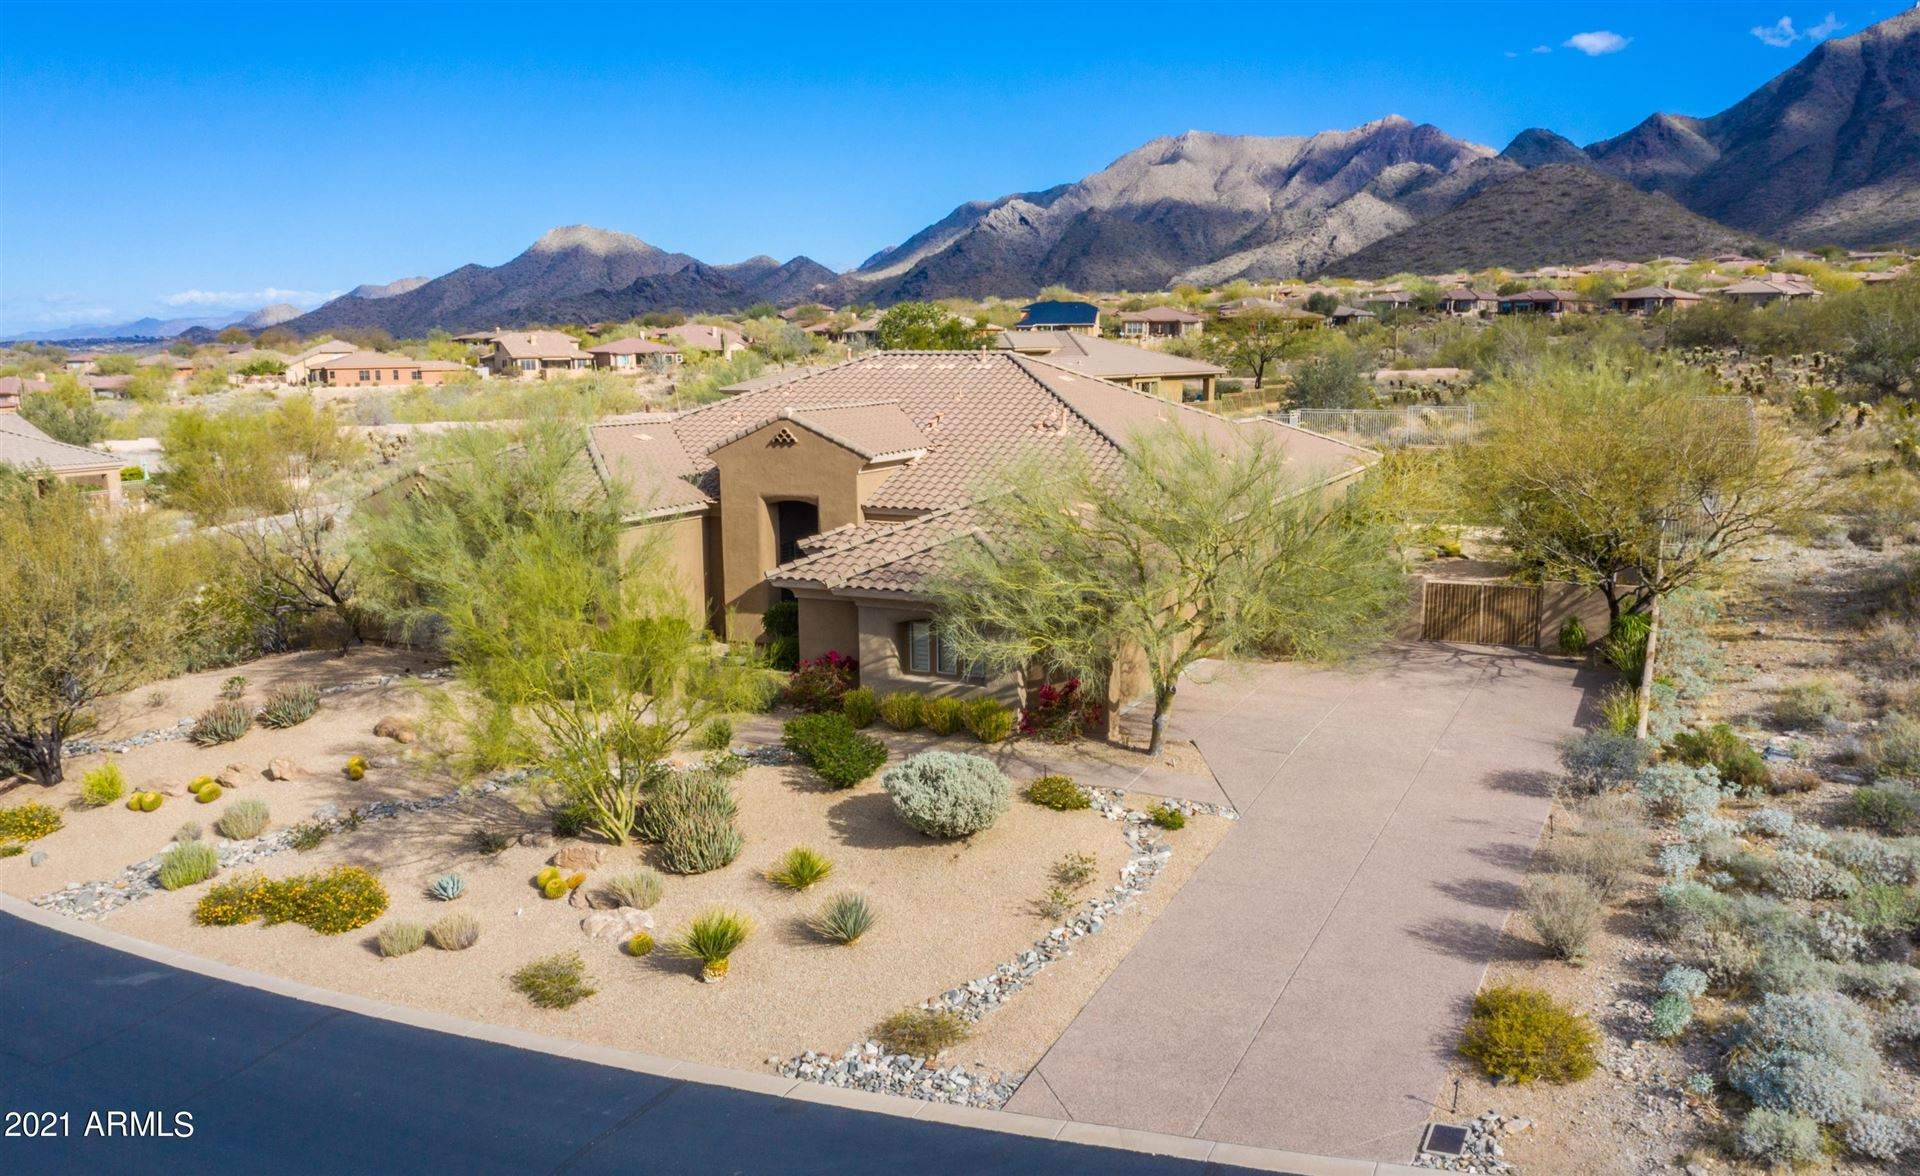 Photo of 11440 E WINCHCOMB Drive, Scottsdale, AZ 85255 (MLS # 6195180)